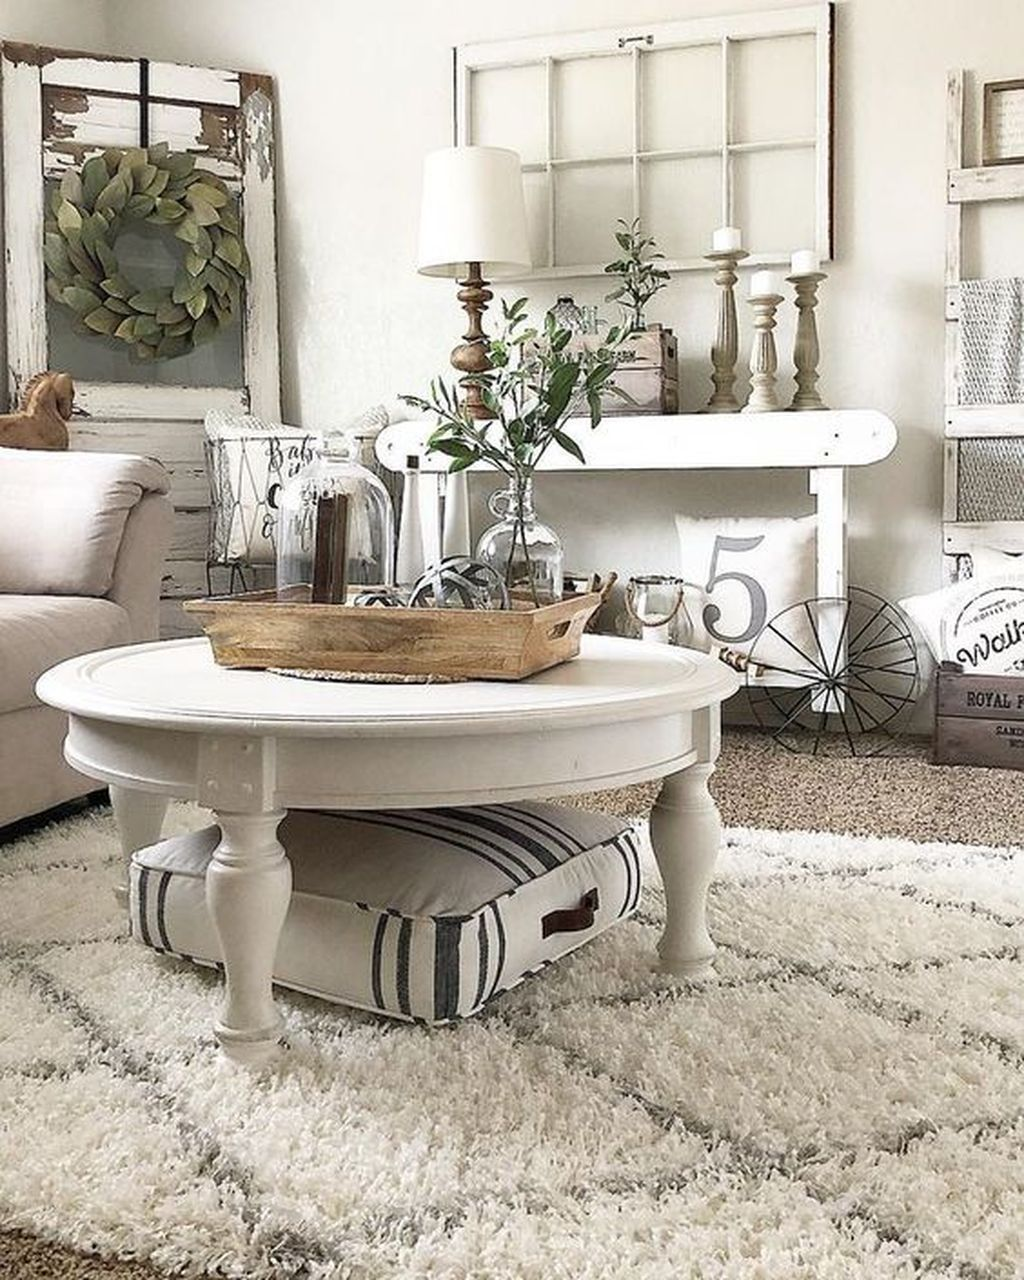 Living Room Modern Ideas Awesome Living Room Modern Small: 36 Amazing Modern Farmhouse Living Room Decor Ideas